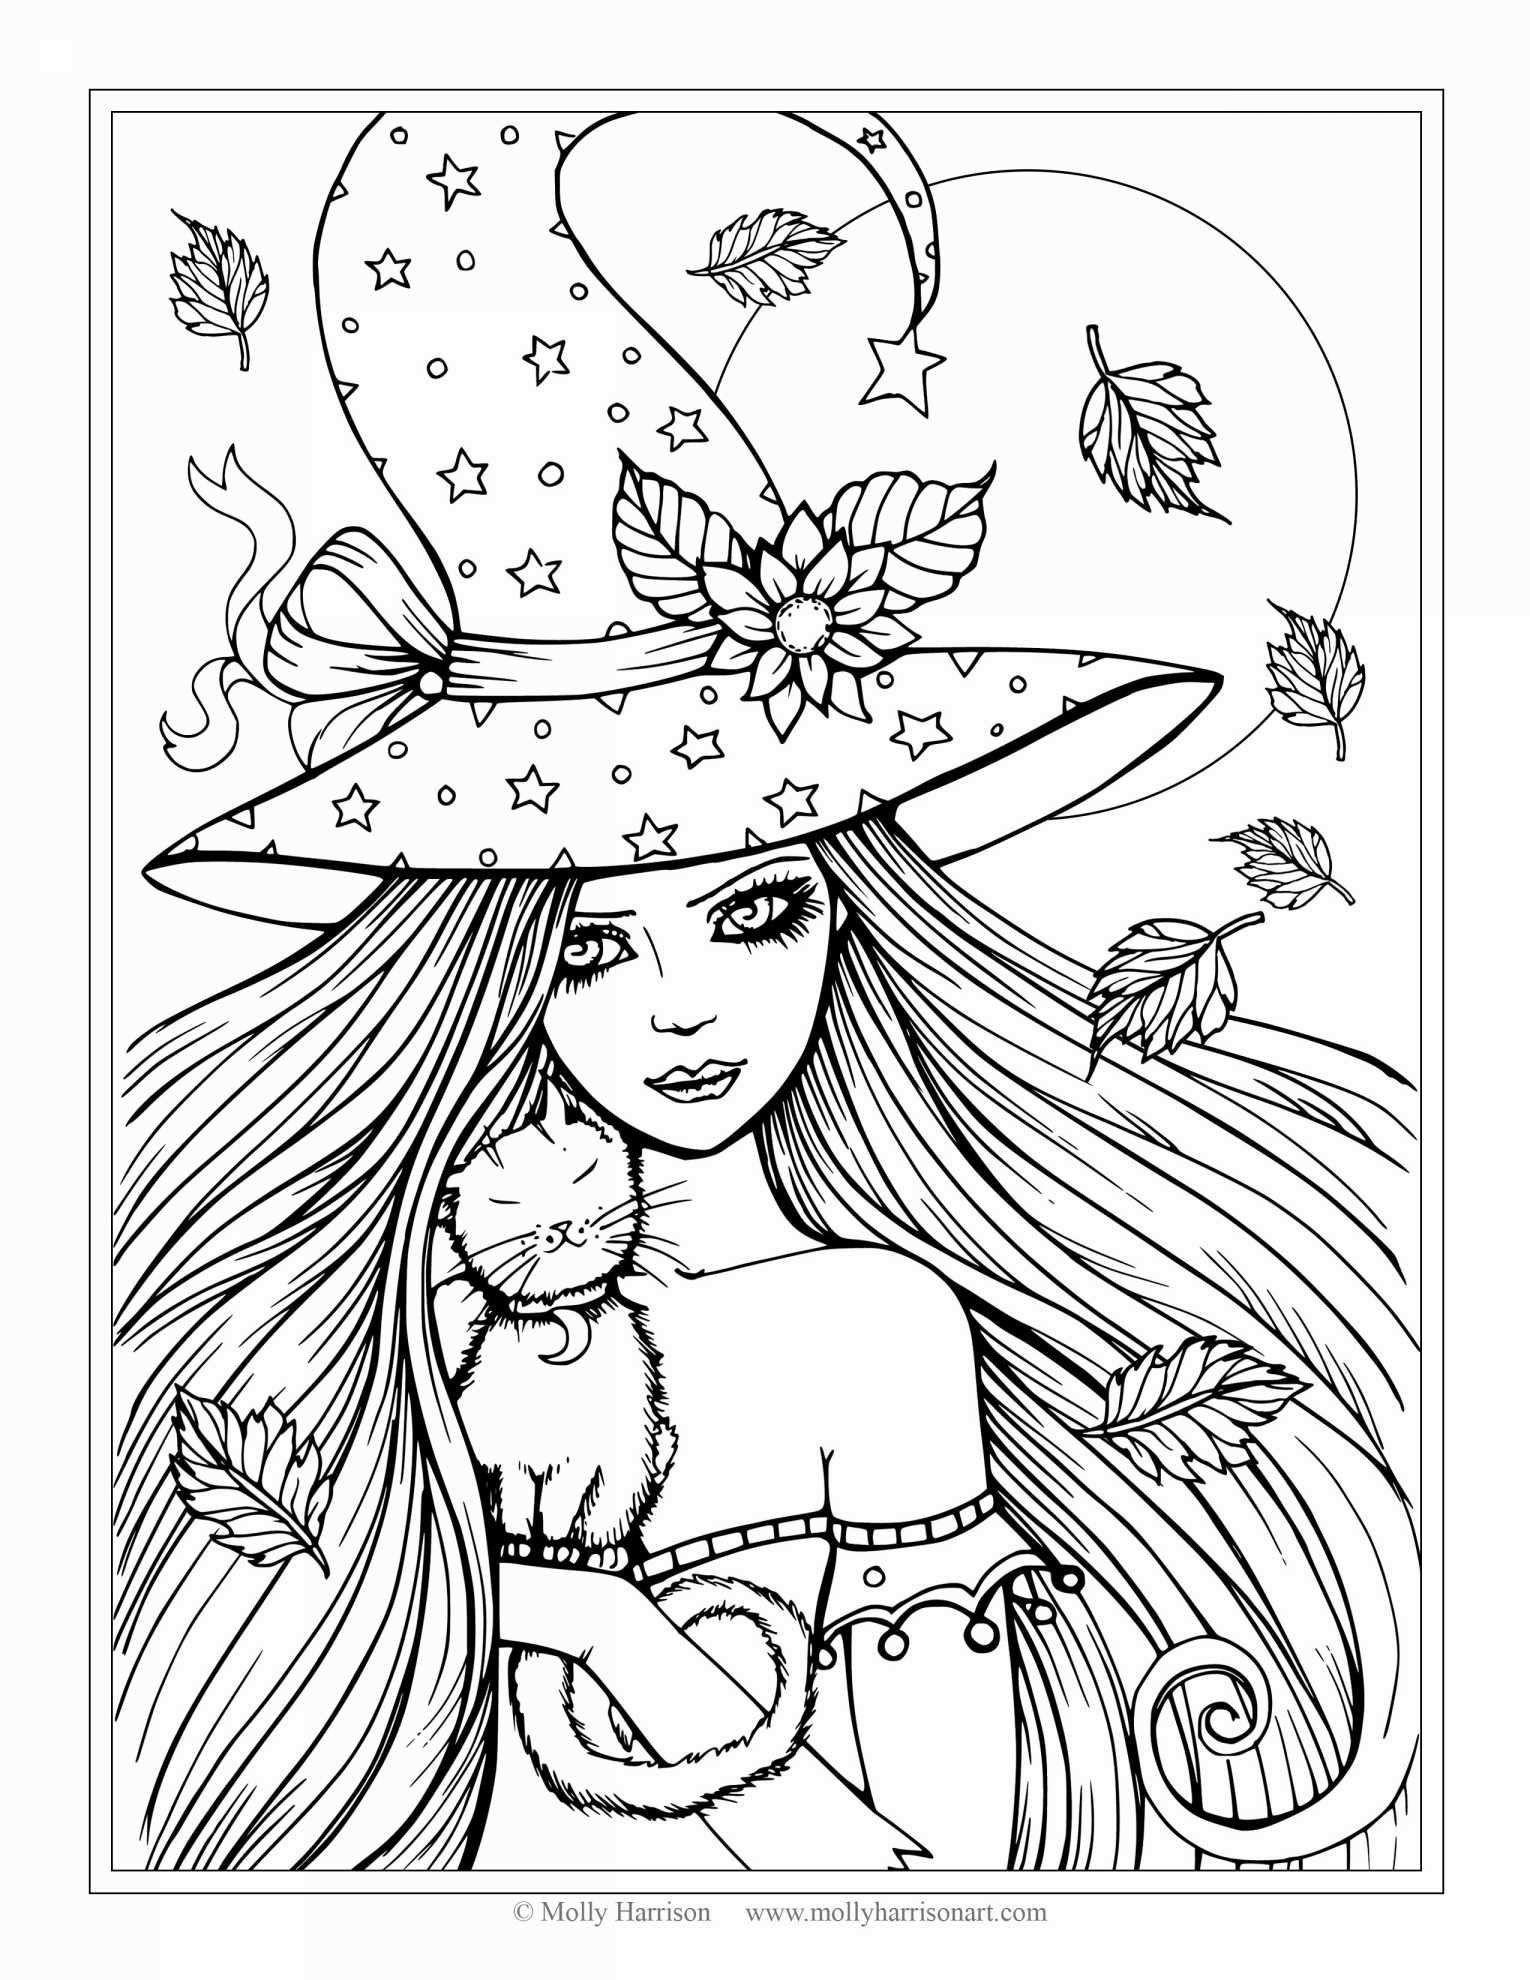 Disney Princess Coloring Pages Elegant Printable Coloring Pages Disney Prince Witch Coloring Pages Halloween Coloring Pages Printable Halloween Coloring Sheets